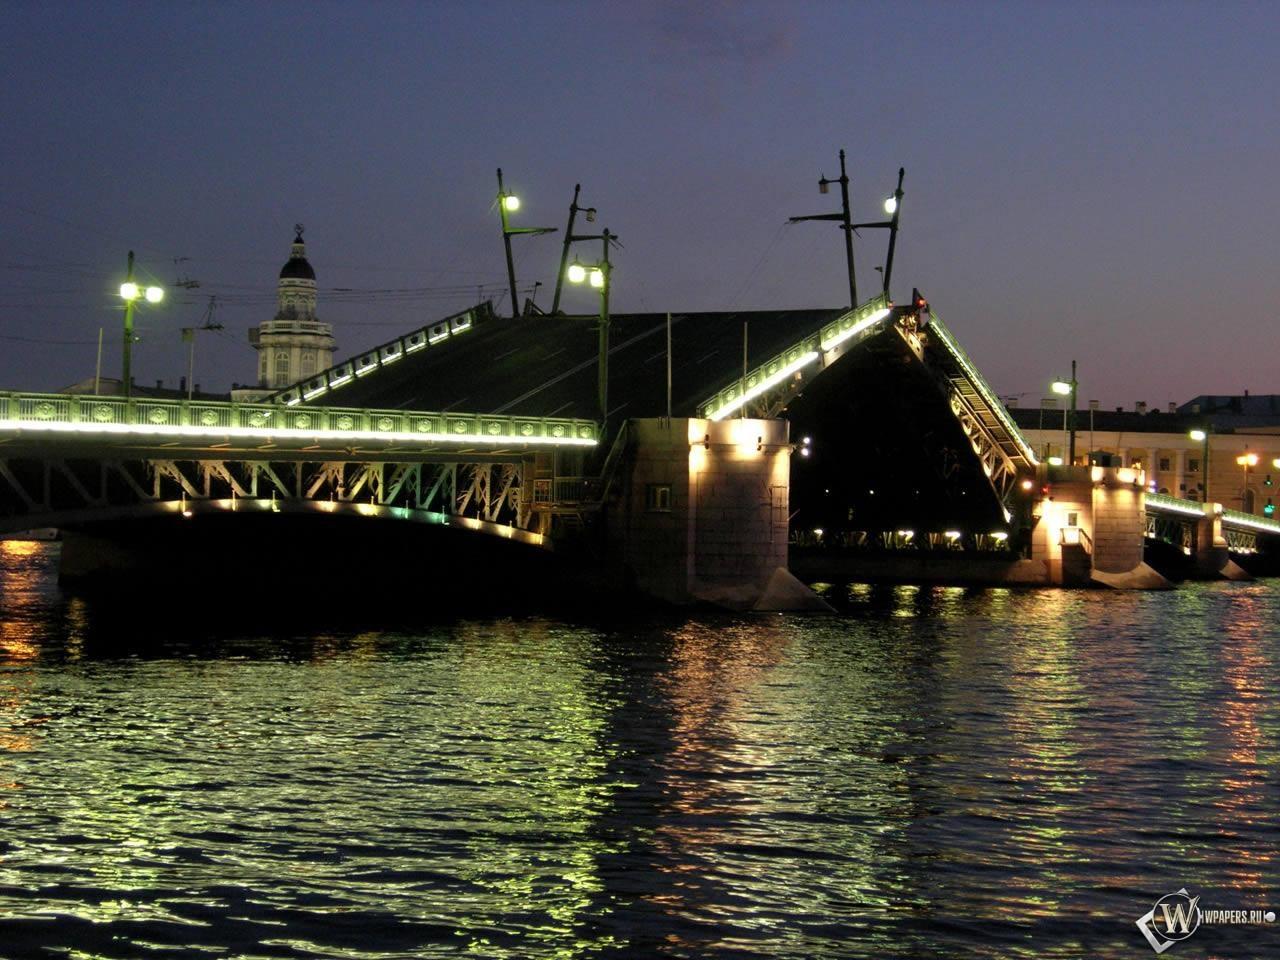 Разводной мост Санкт-Петербург 1280x960